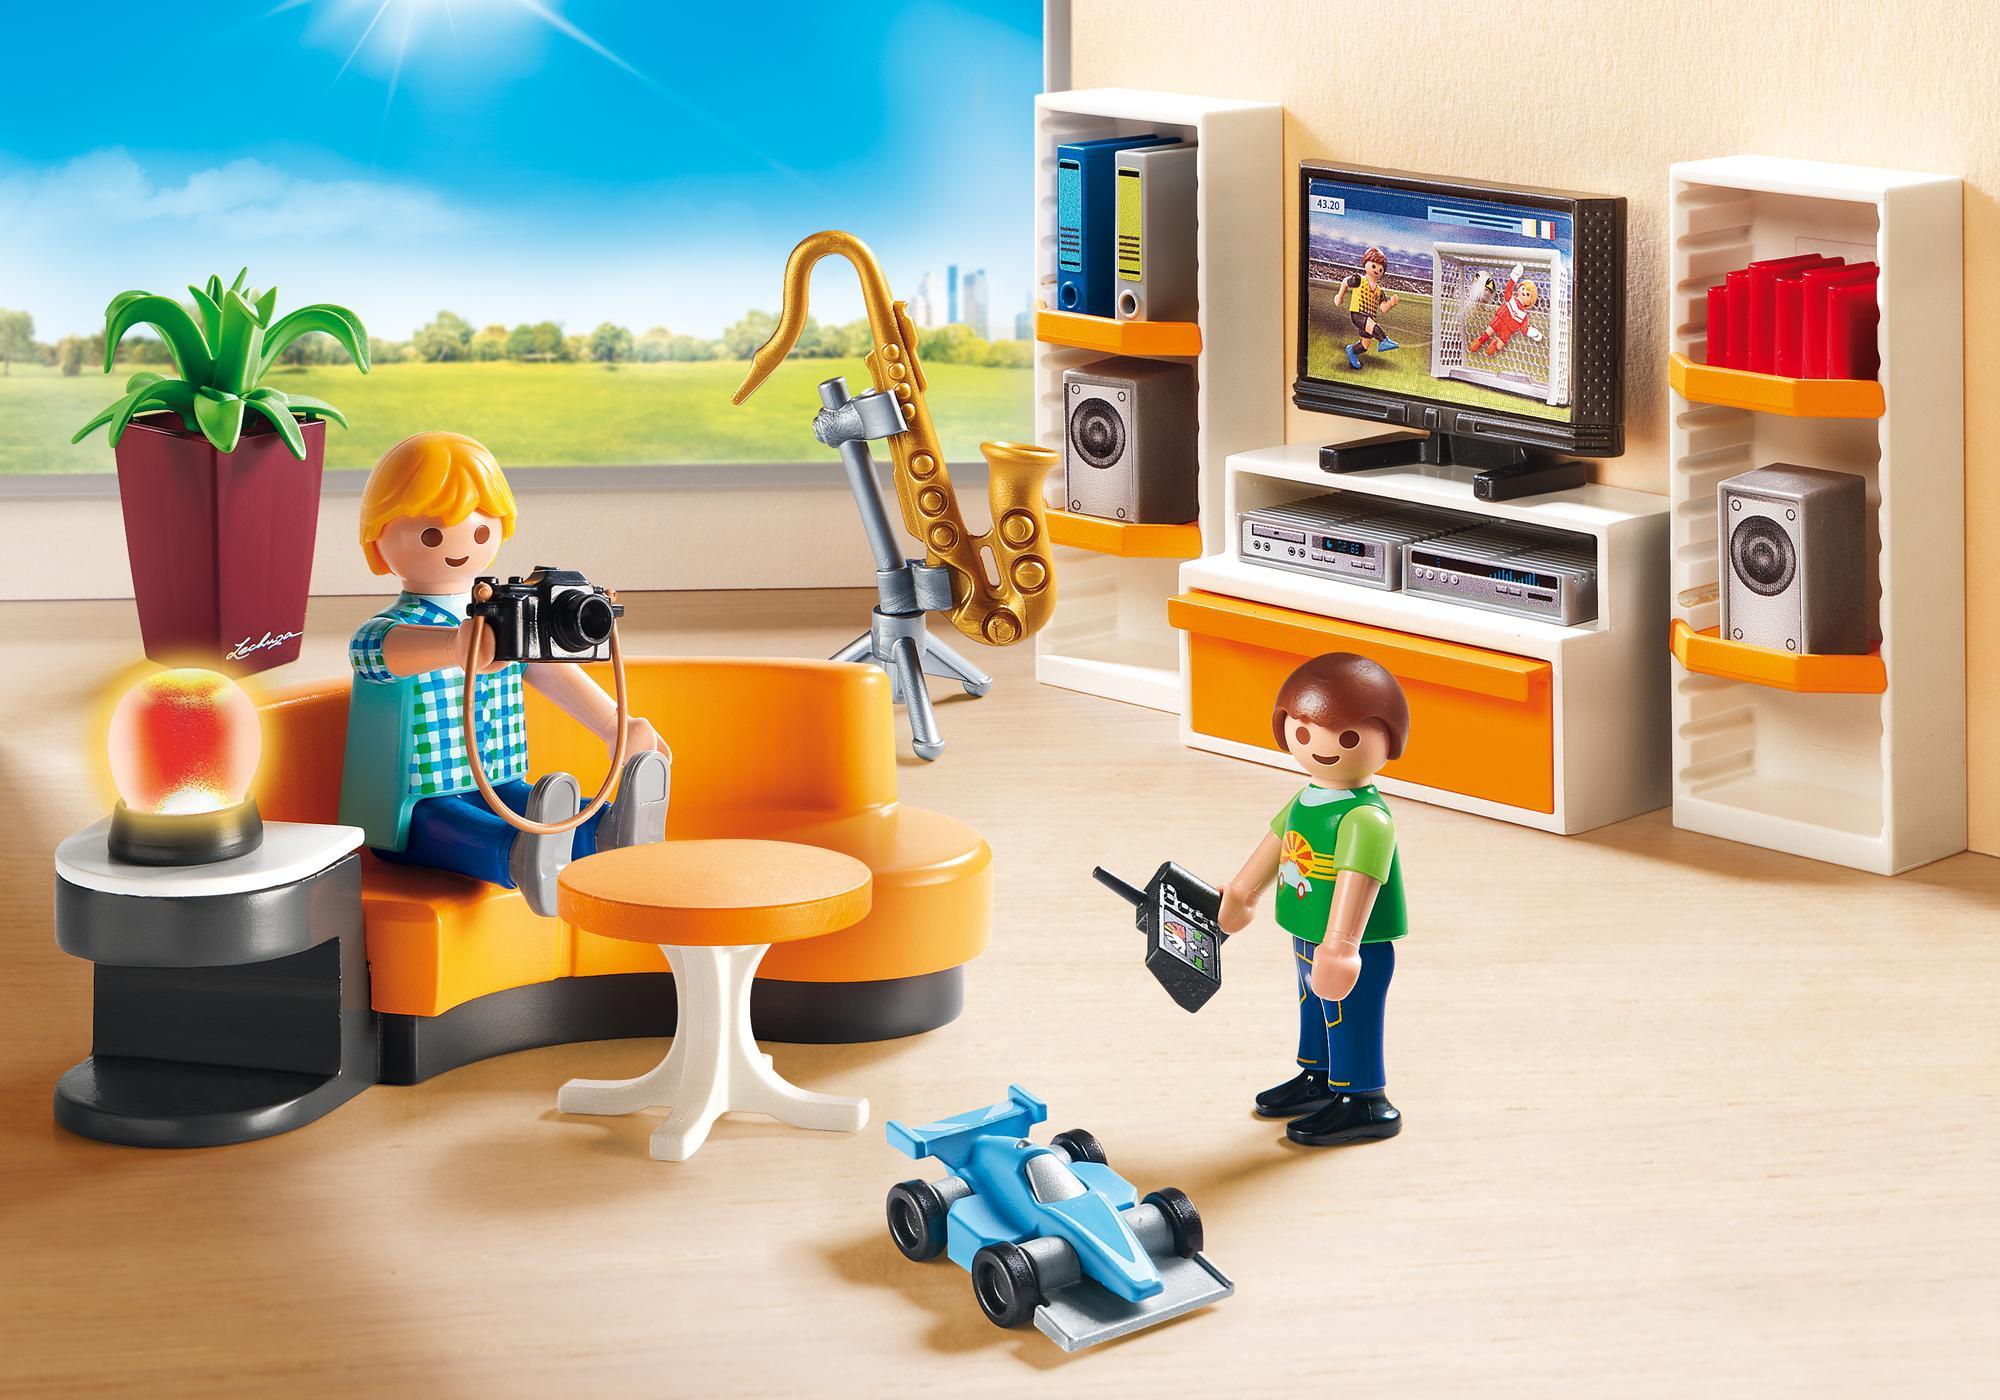 http://media.playmobil.com/i/playmobil/9267_product_detail/Soggiorno con mobile TV